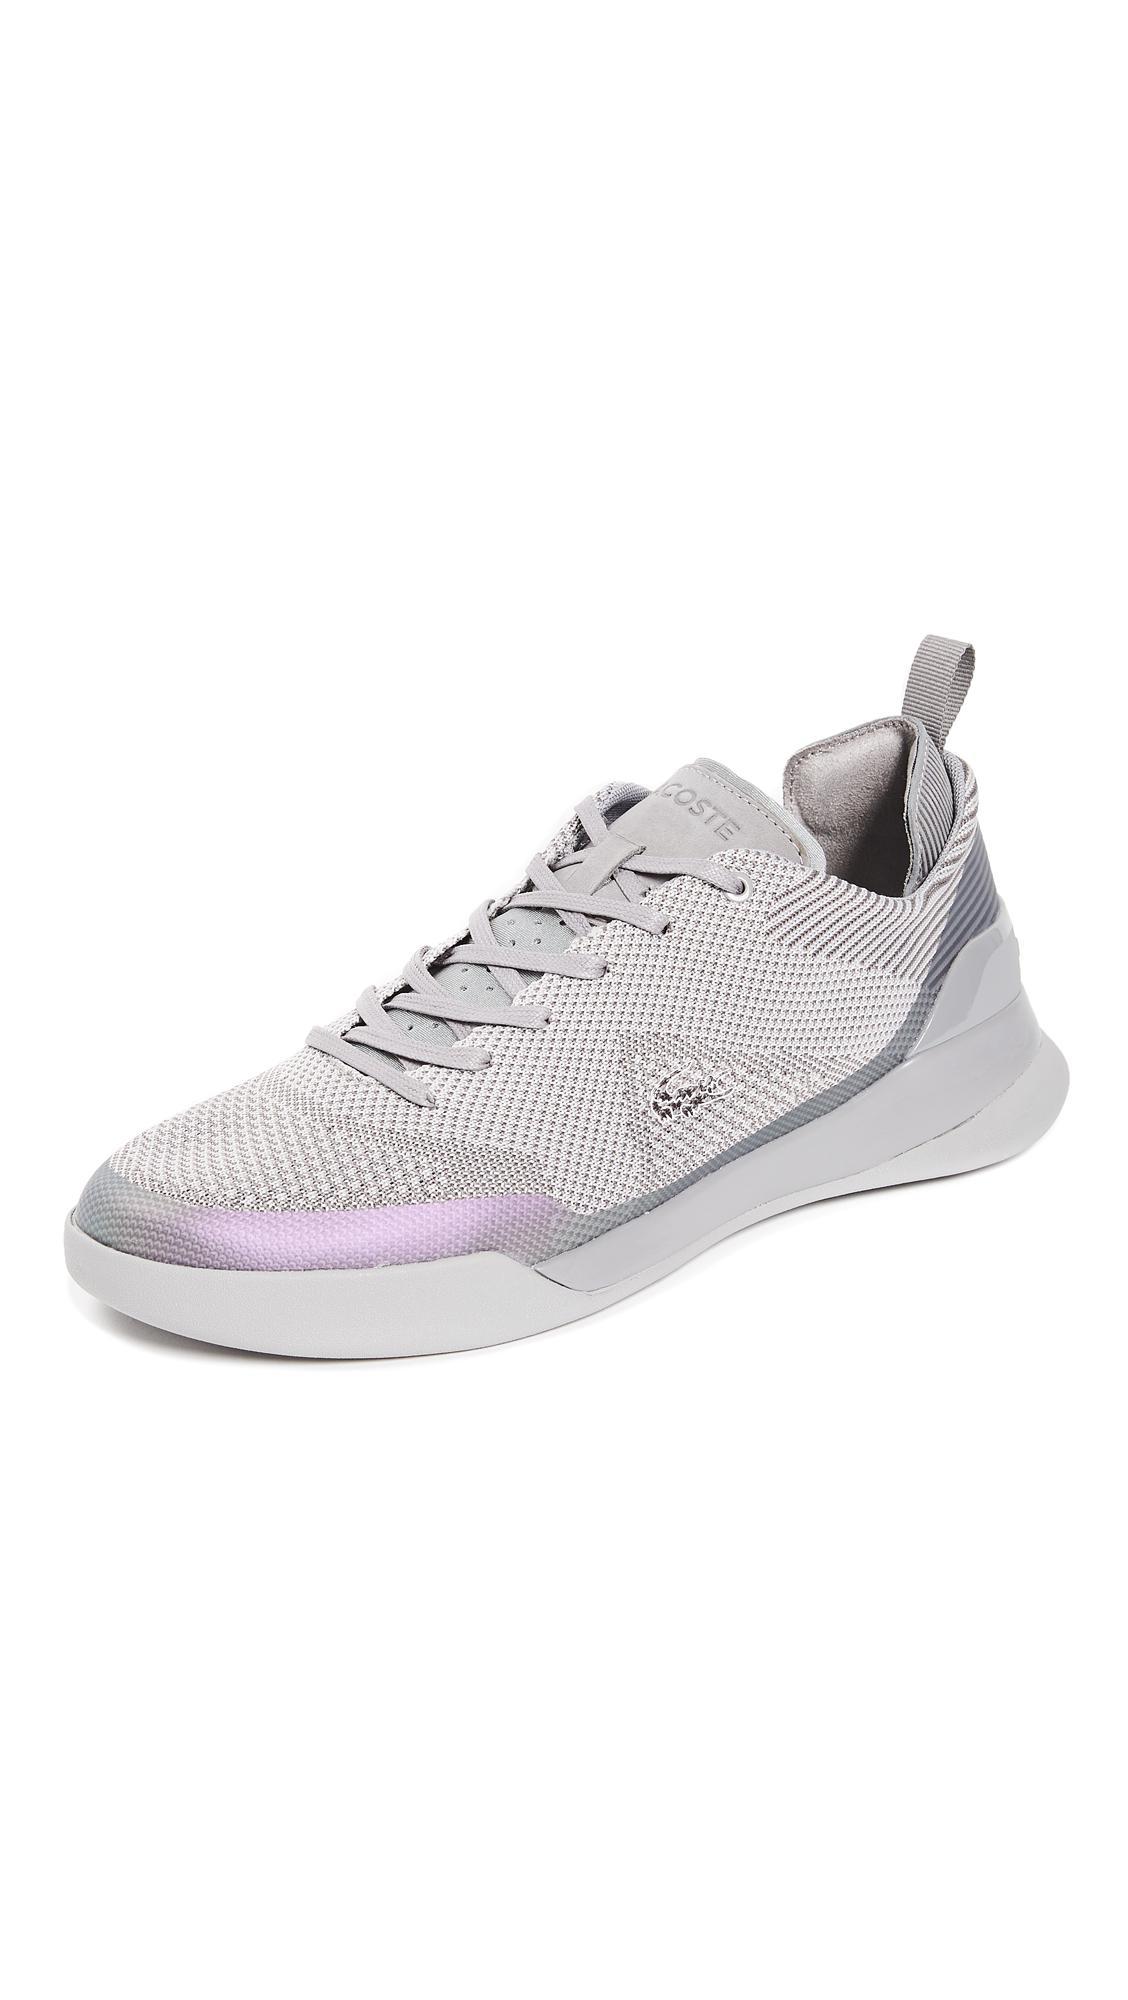 856d40d0d99207 Lacoste Lt Dual Elite Sneakers in Gray for Men - Lyst